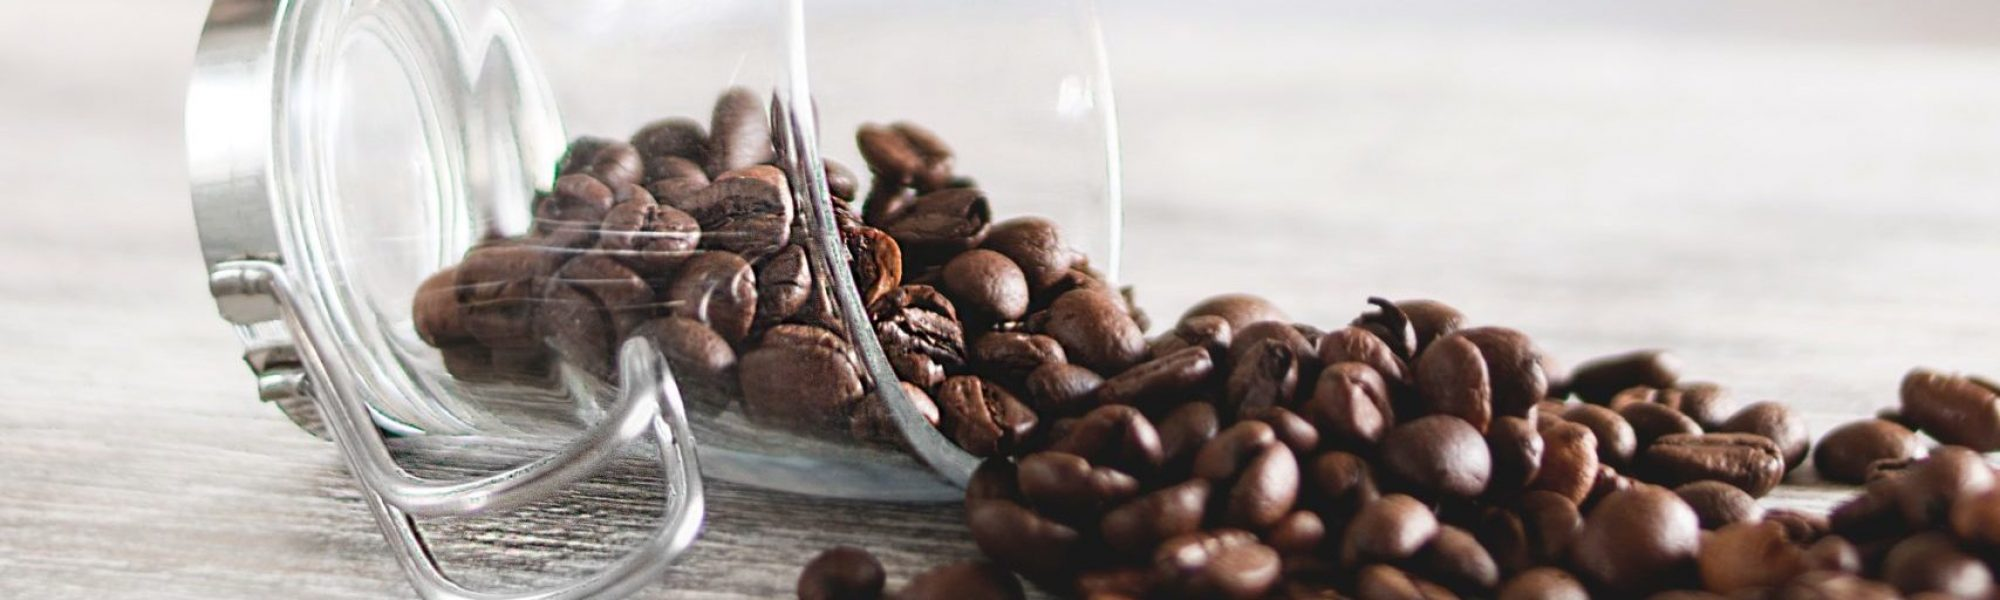 aromatic-coffee-coffee-beans-977878